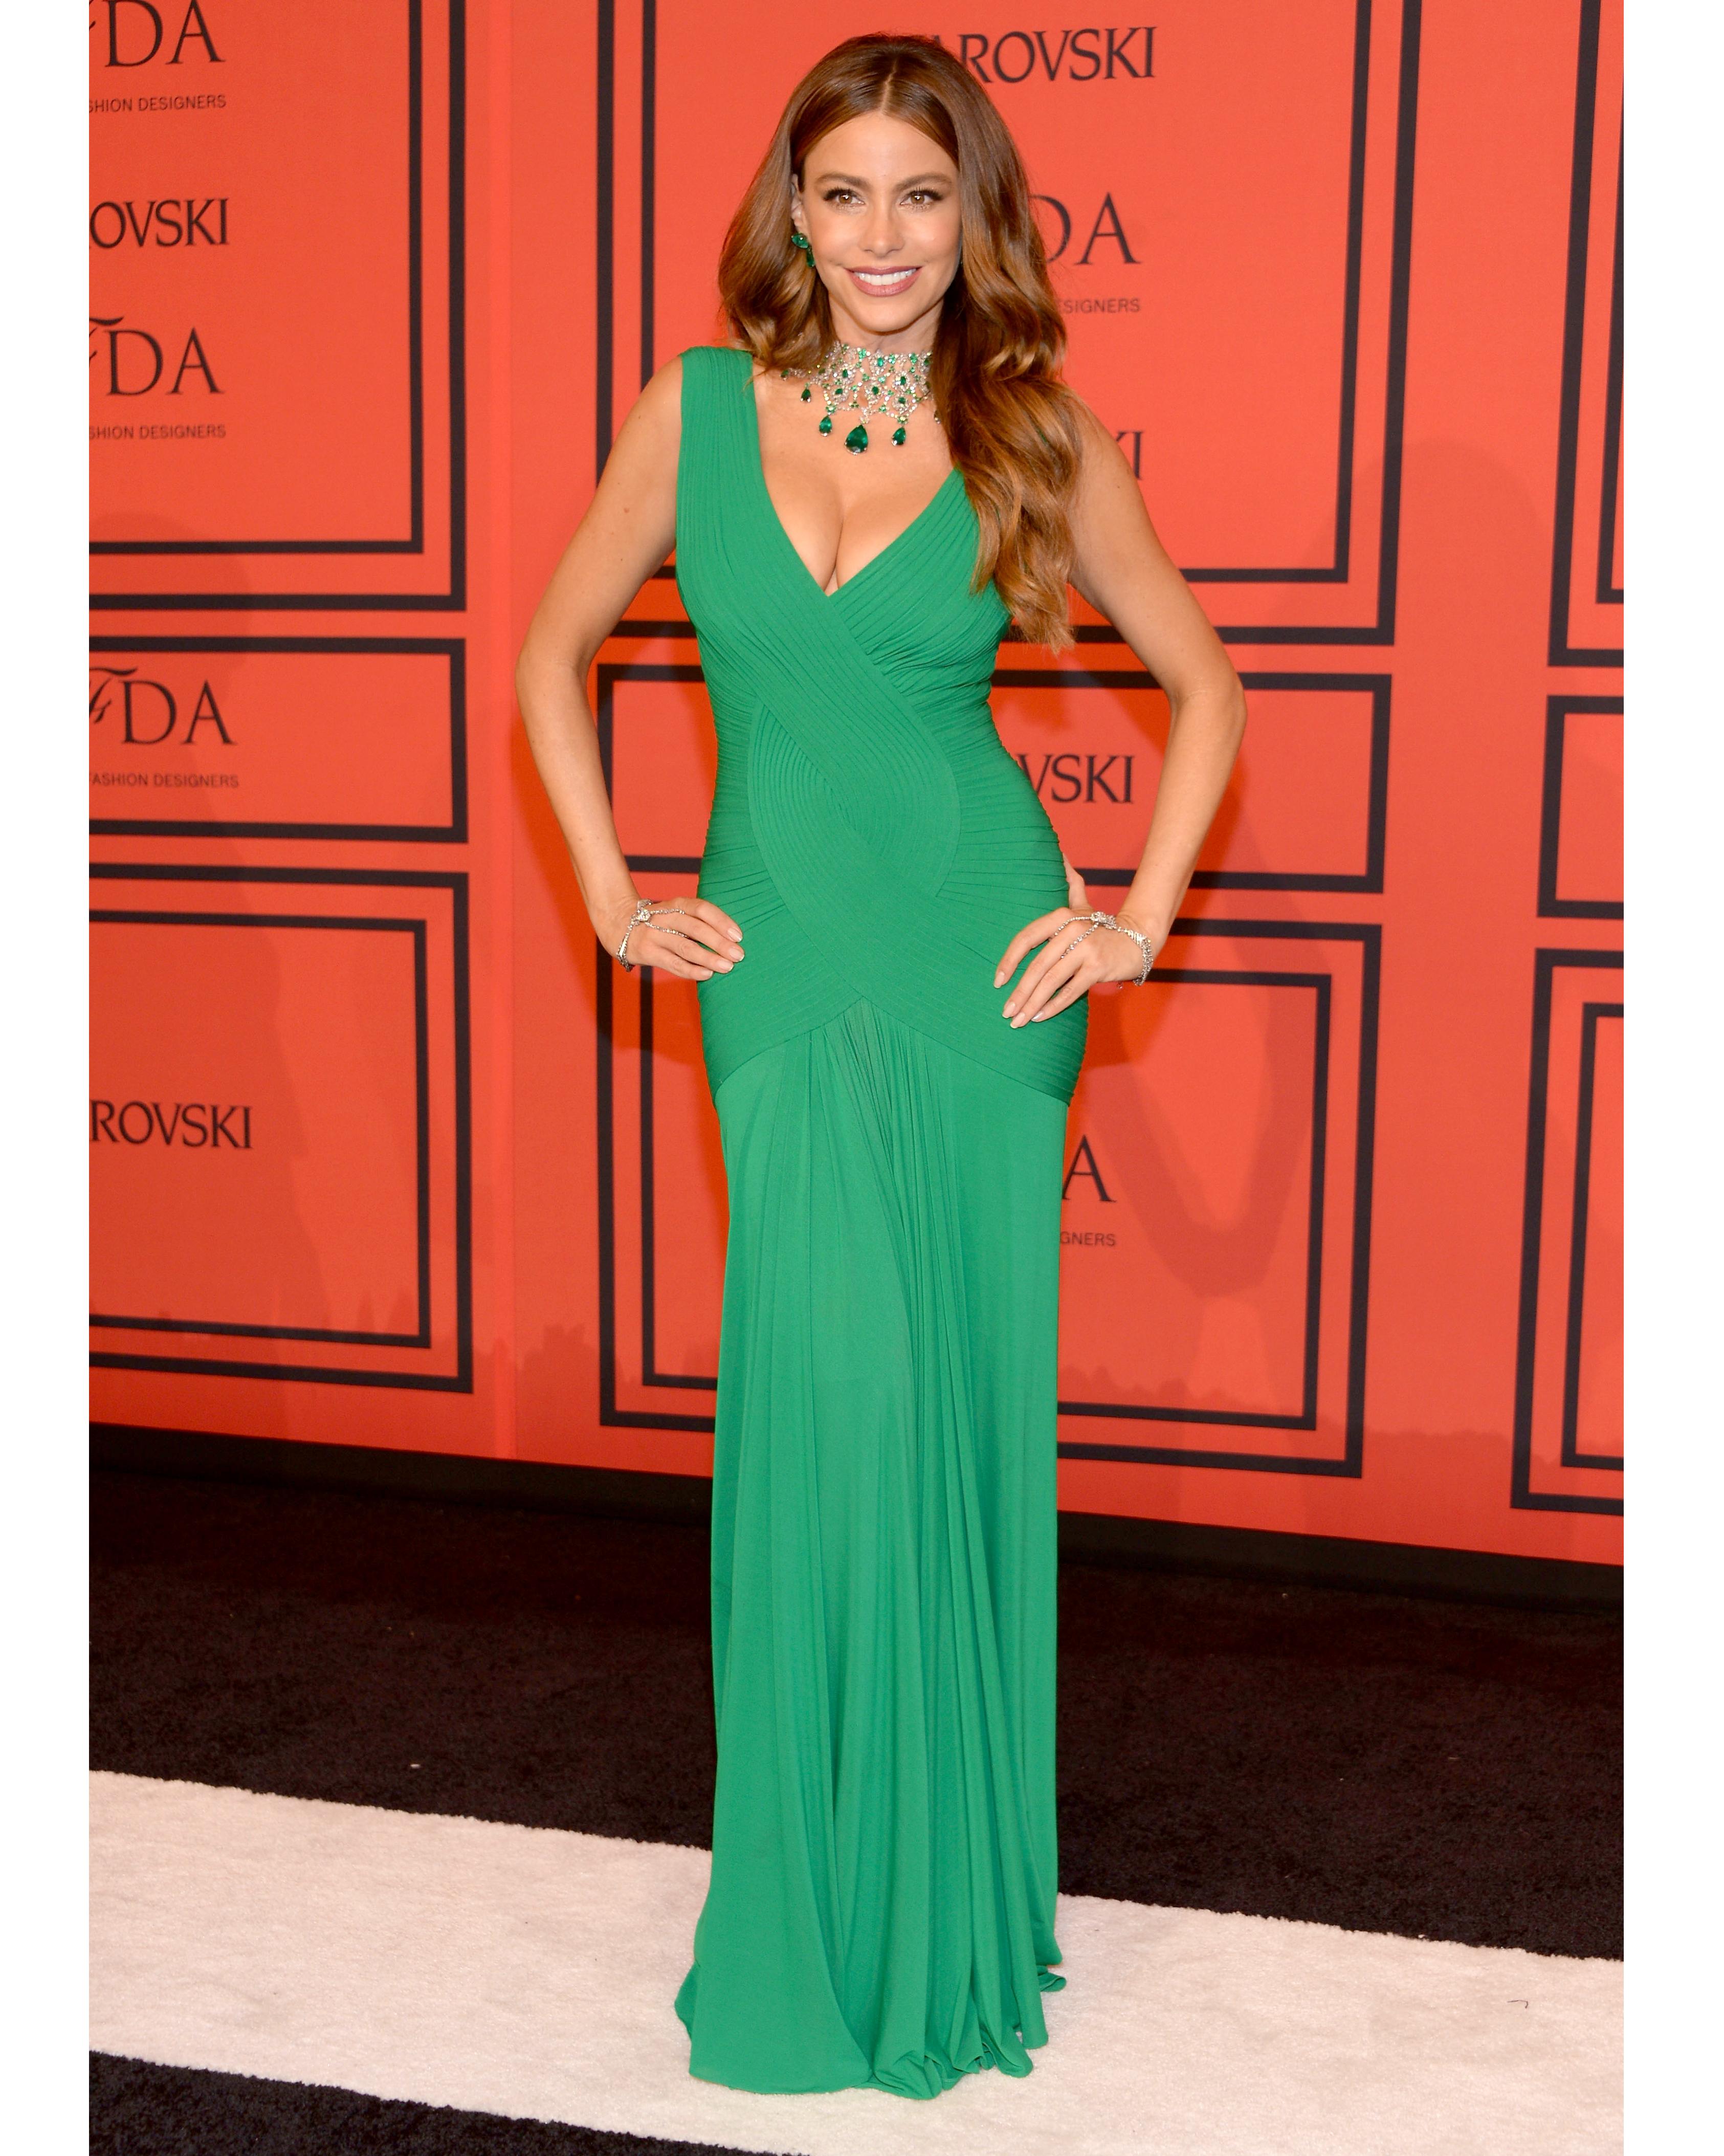 sofia-vergara-red-carpet-cfda-fashion-awards-herve-l-leroux-green-0815.jpg